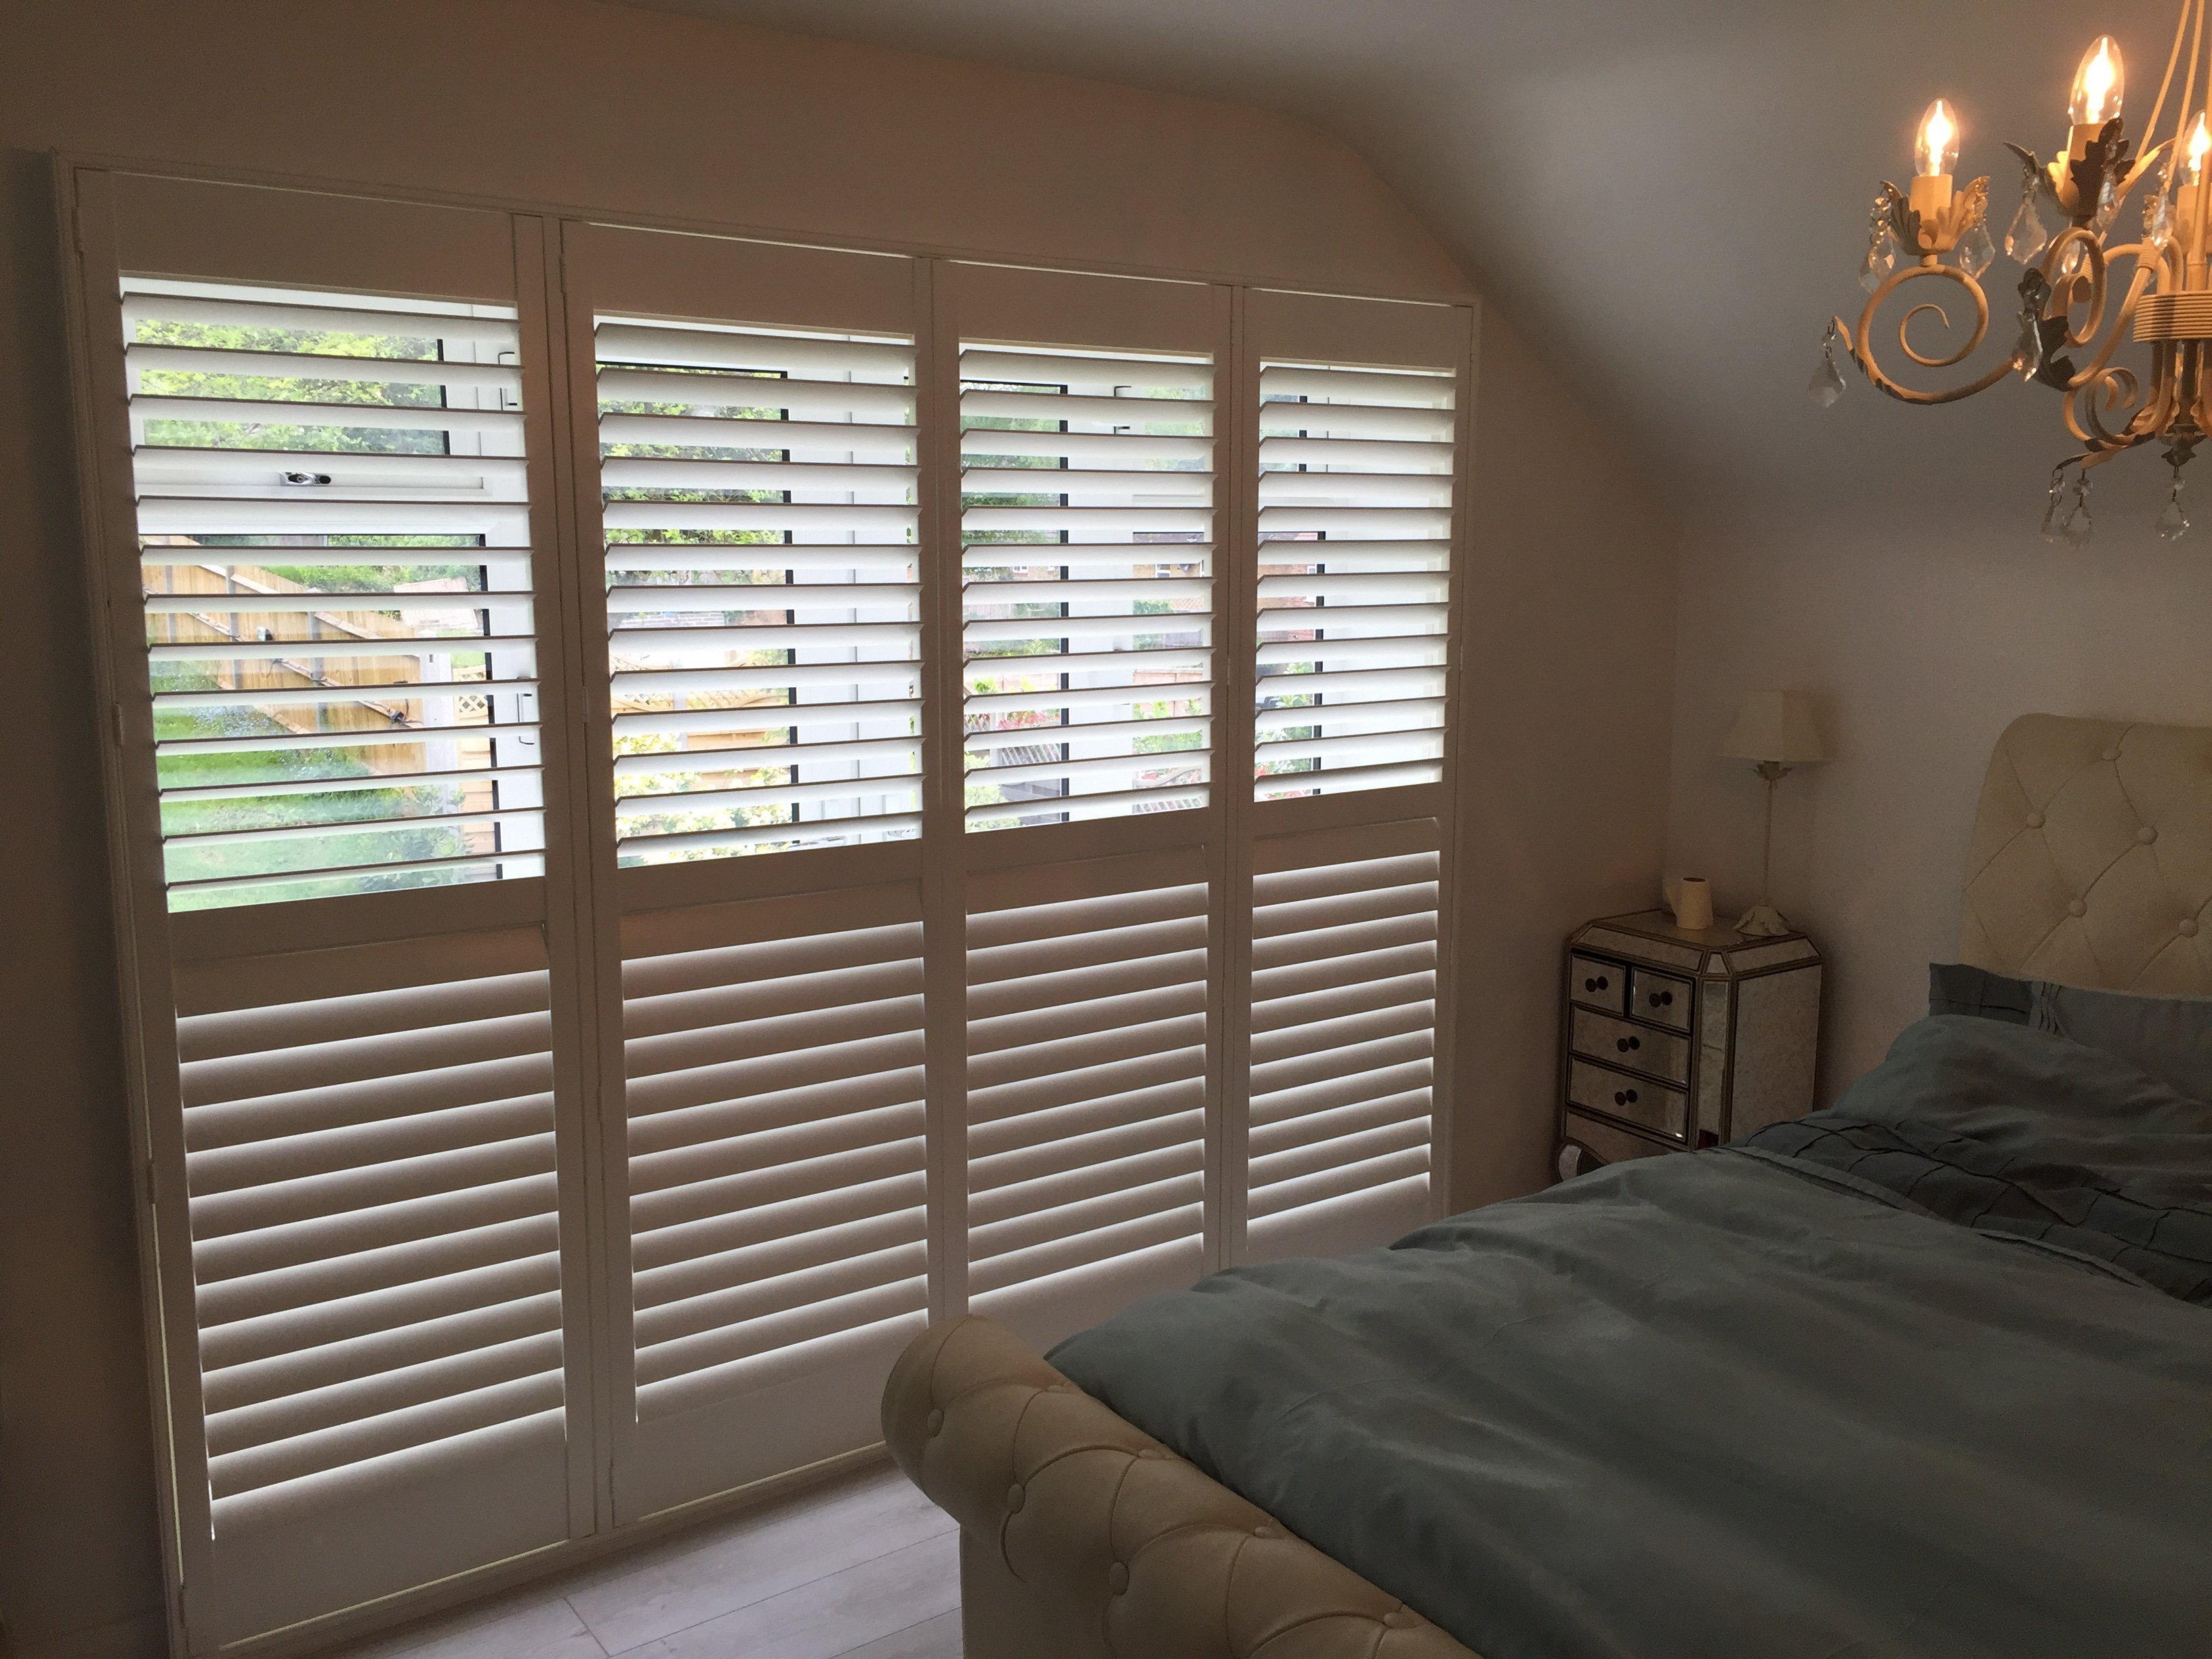 Fulll height Window Shutters along bedroom wall